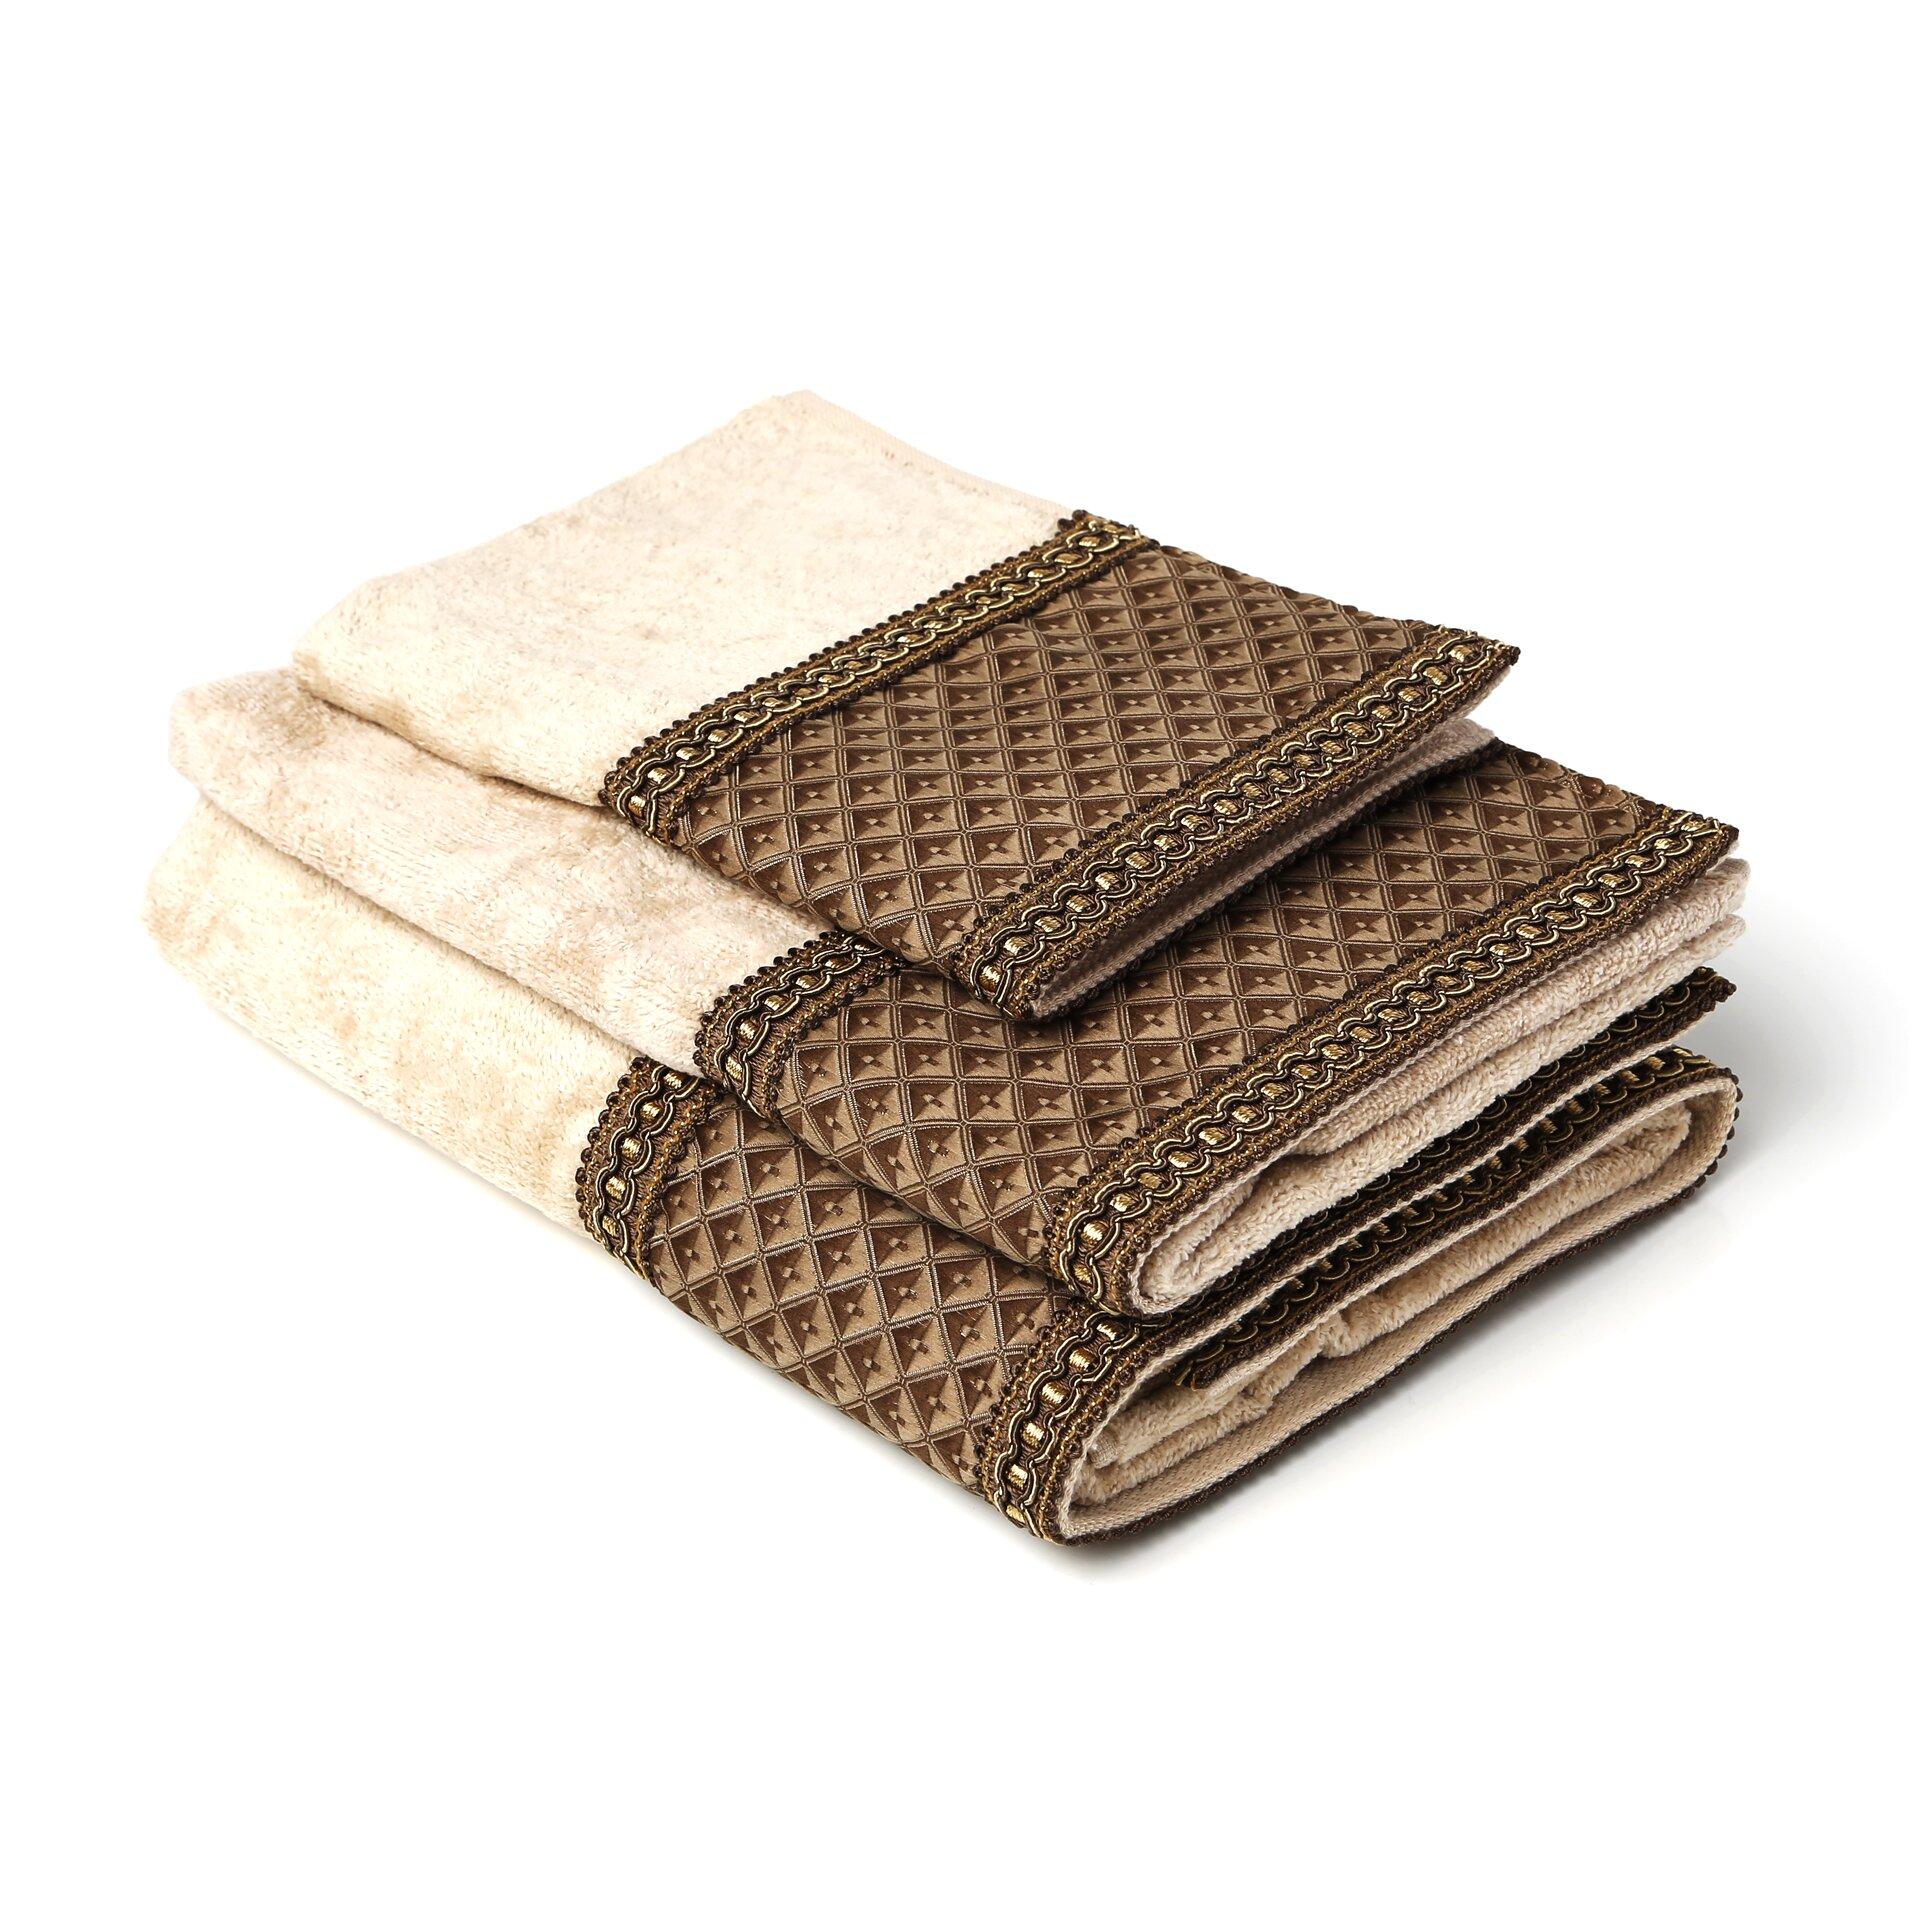 Sherry Kline Amore Decorative 3 Piece Towel Set & Reviews ...